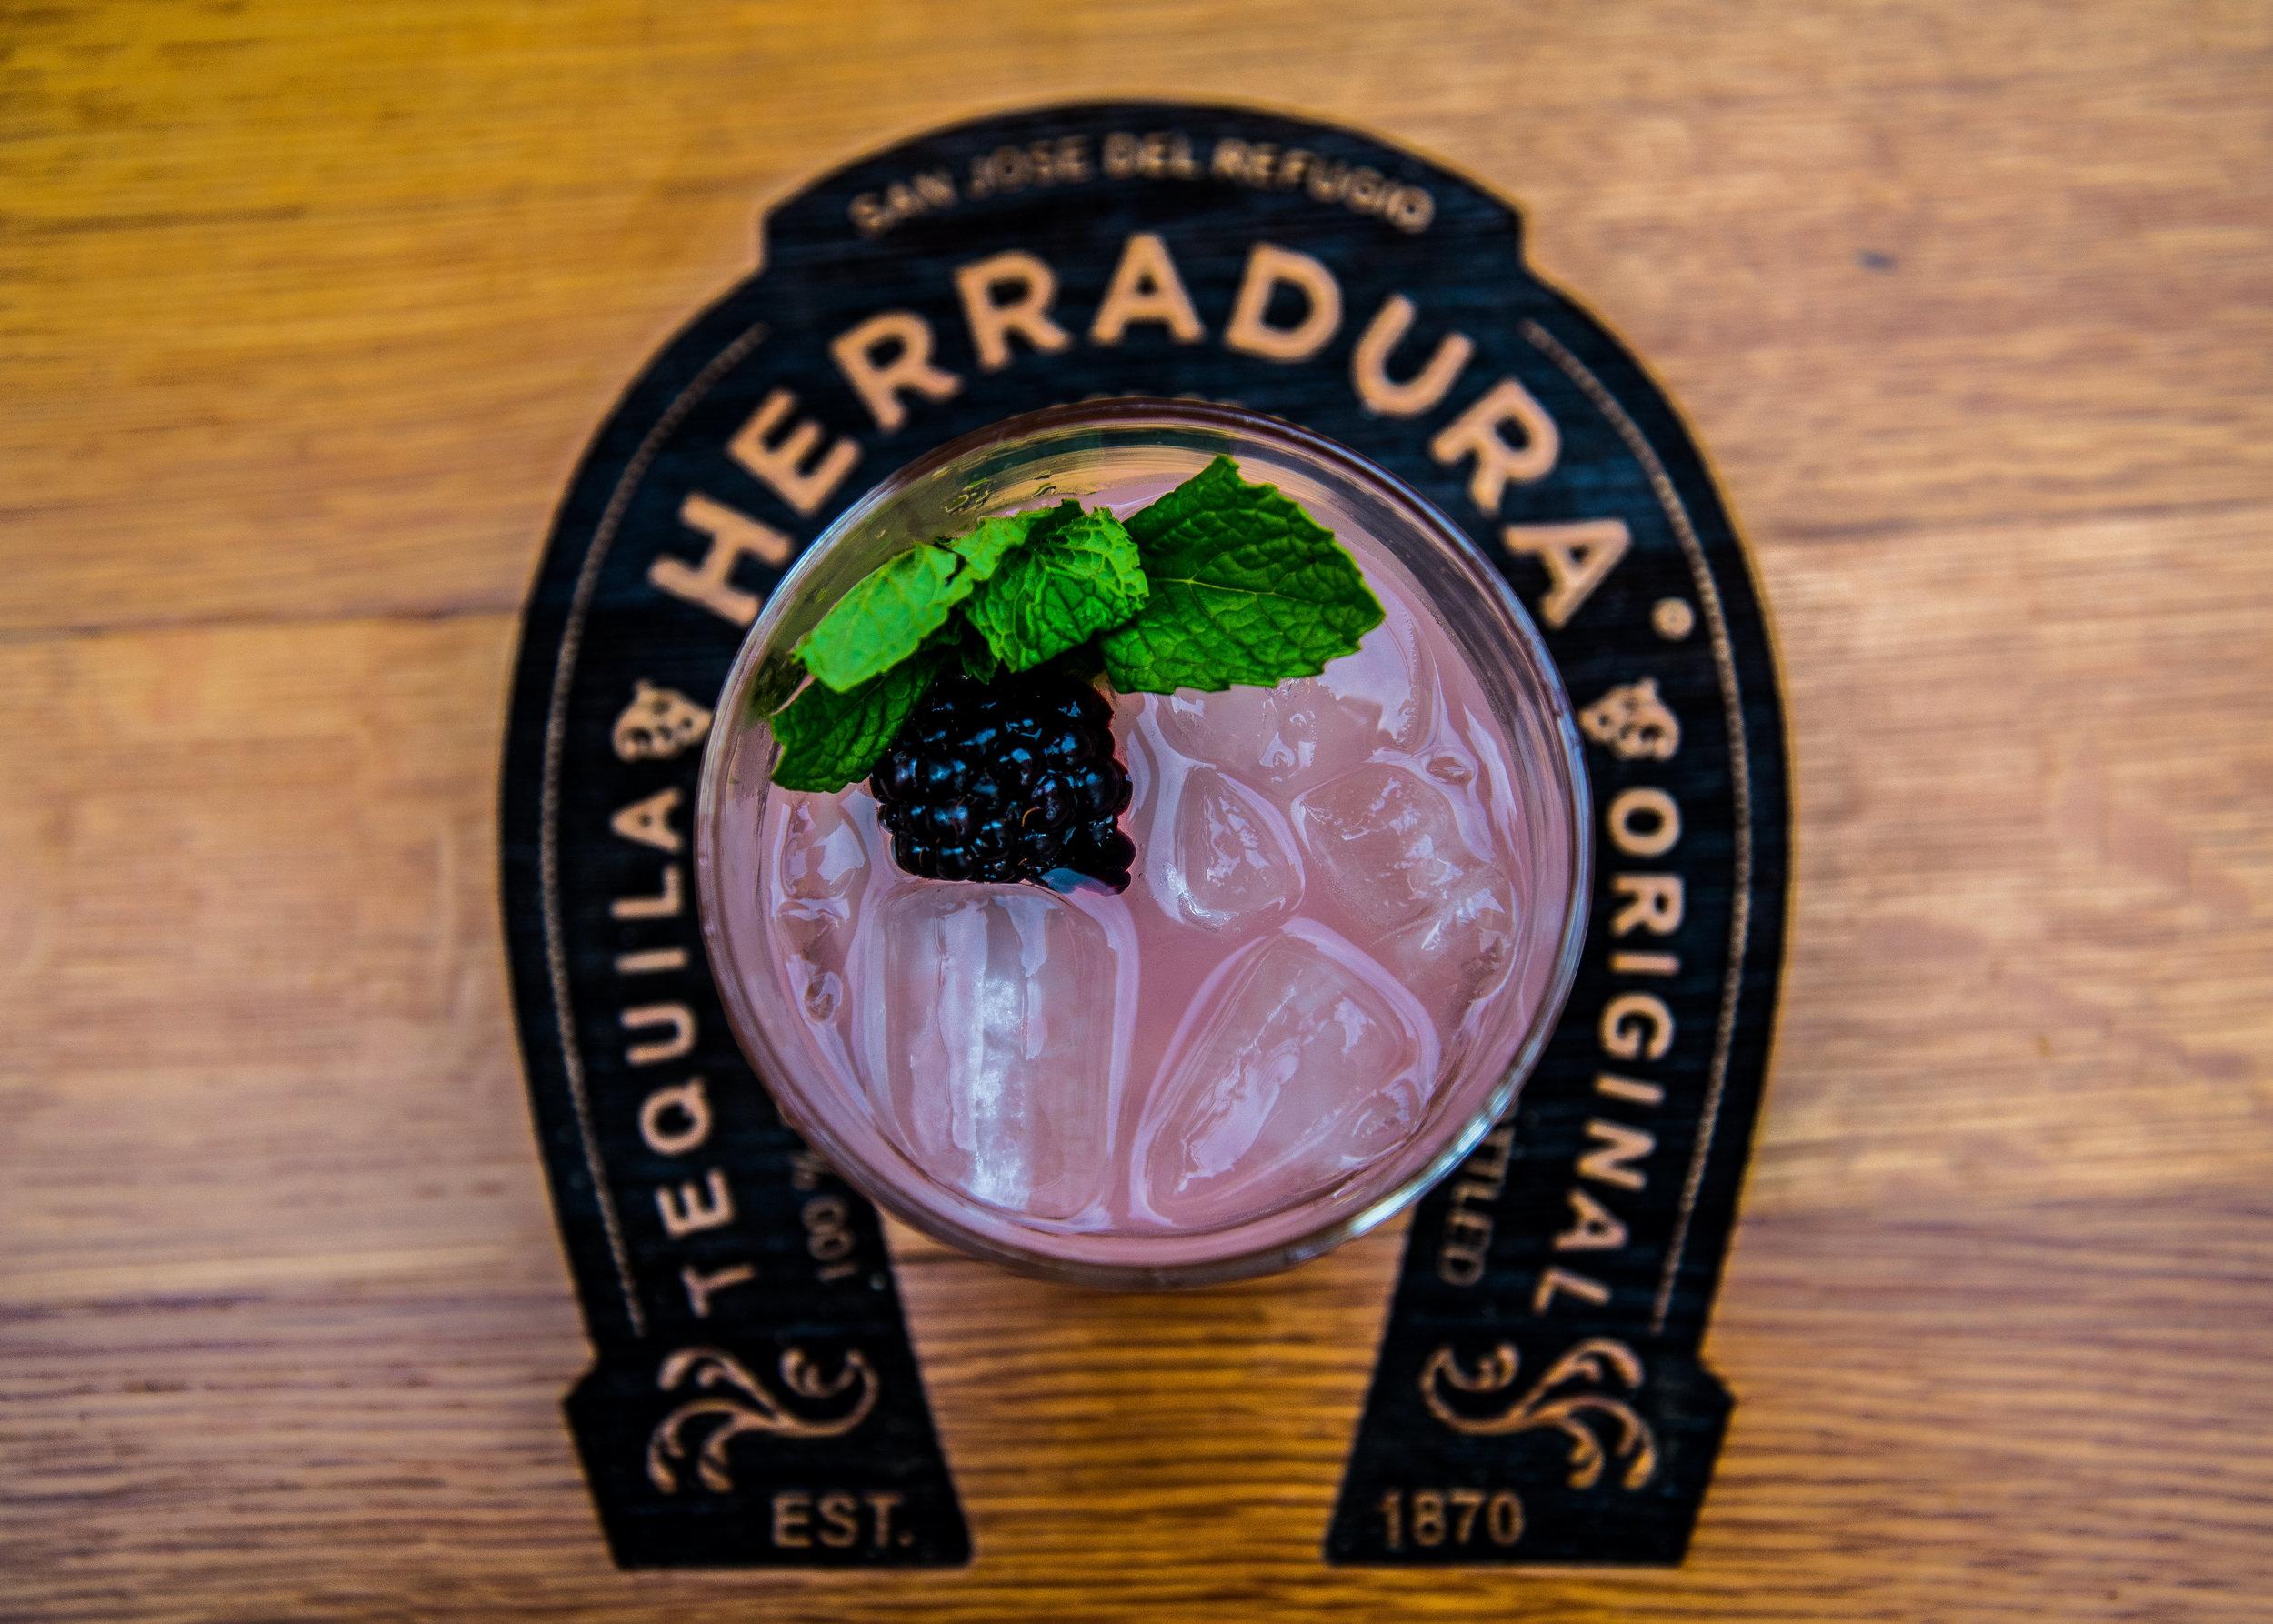 No one was complaining about these amazing  Tequila Herradura  Cocktails on tap: Black Raspberry Paloma: Herradura Silver, Grapefruit Soda, Chambord Liquor, garnished w Blackberries &Mint.Good thing there was plenty to go around!